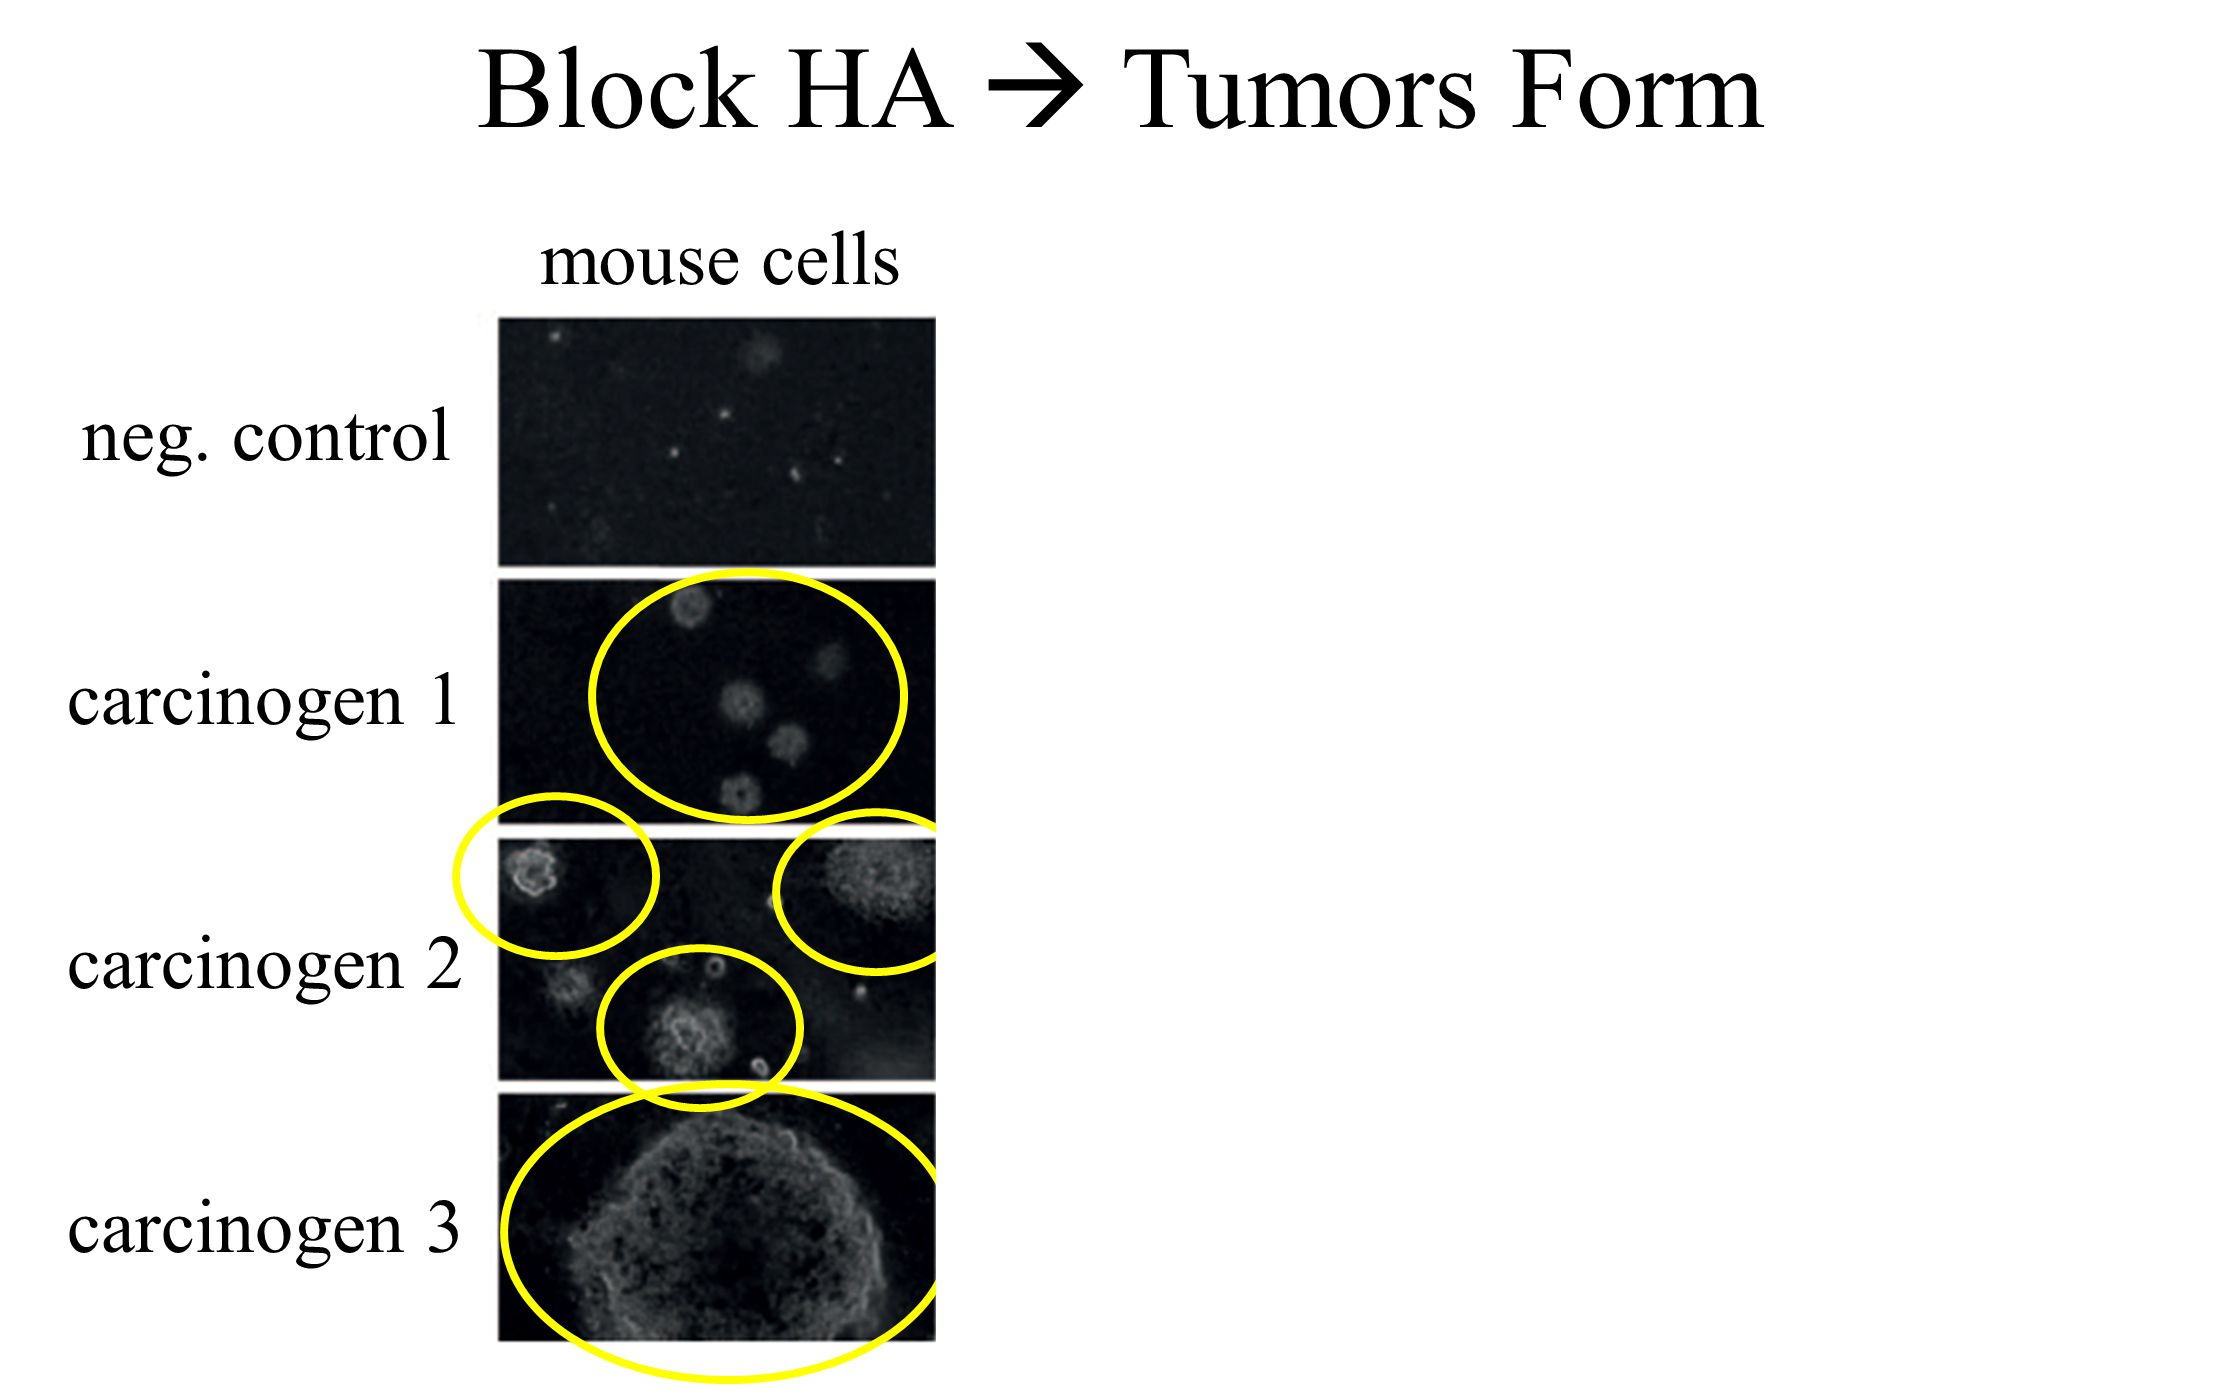 Block HA  Tumors Form neg. control carcinogen 1 carcinogen 2 carcinogen 3 mouse cells NMR NMR - HA